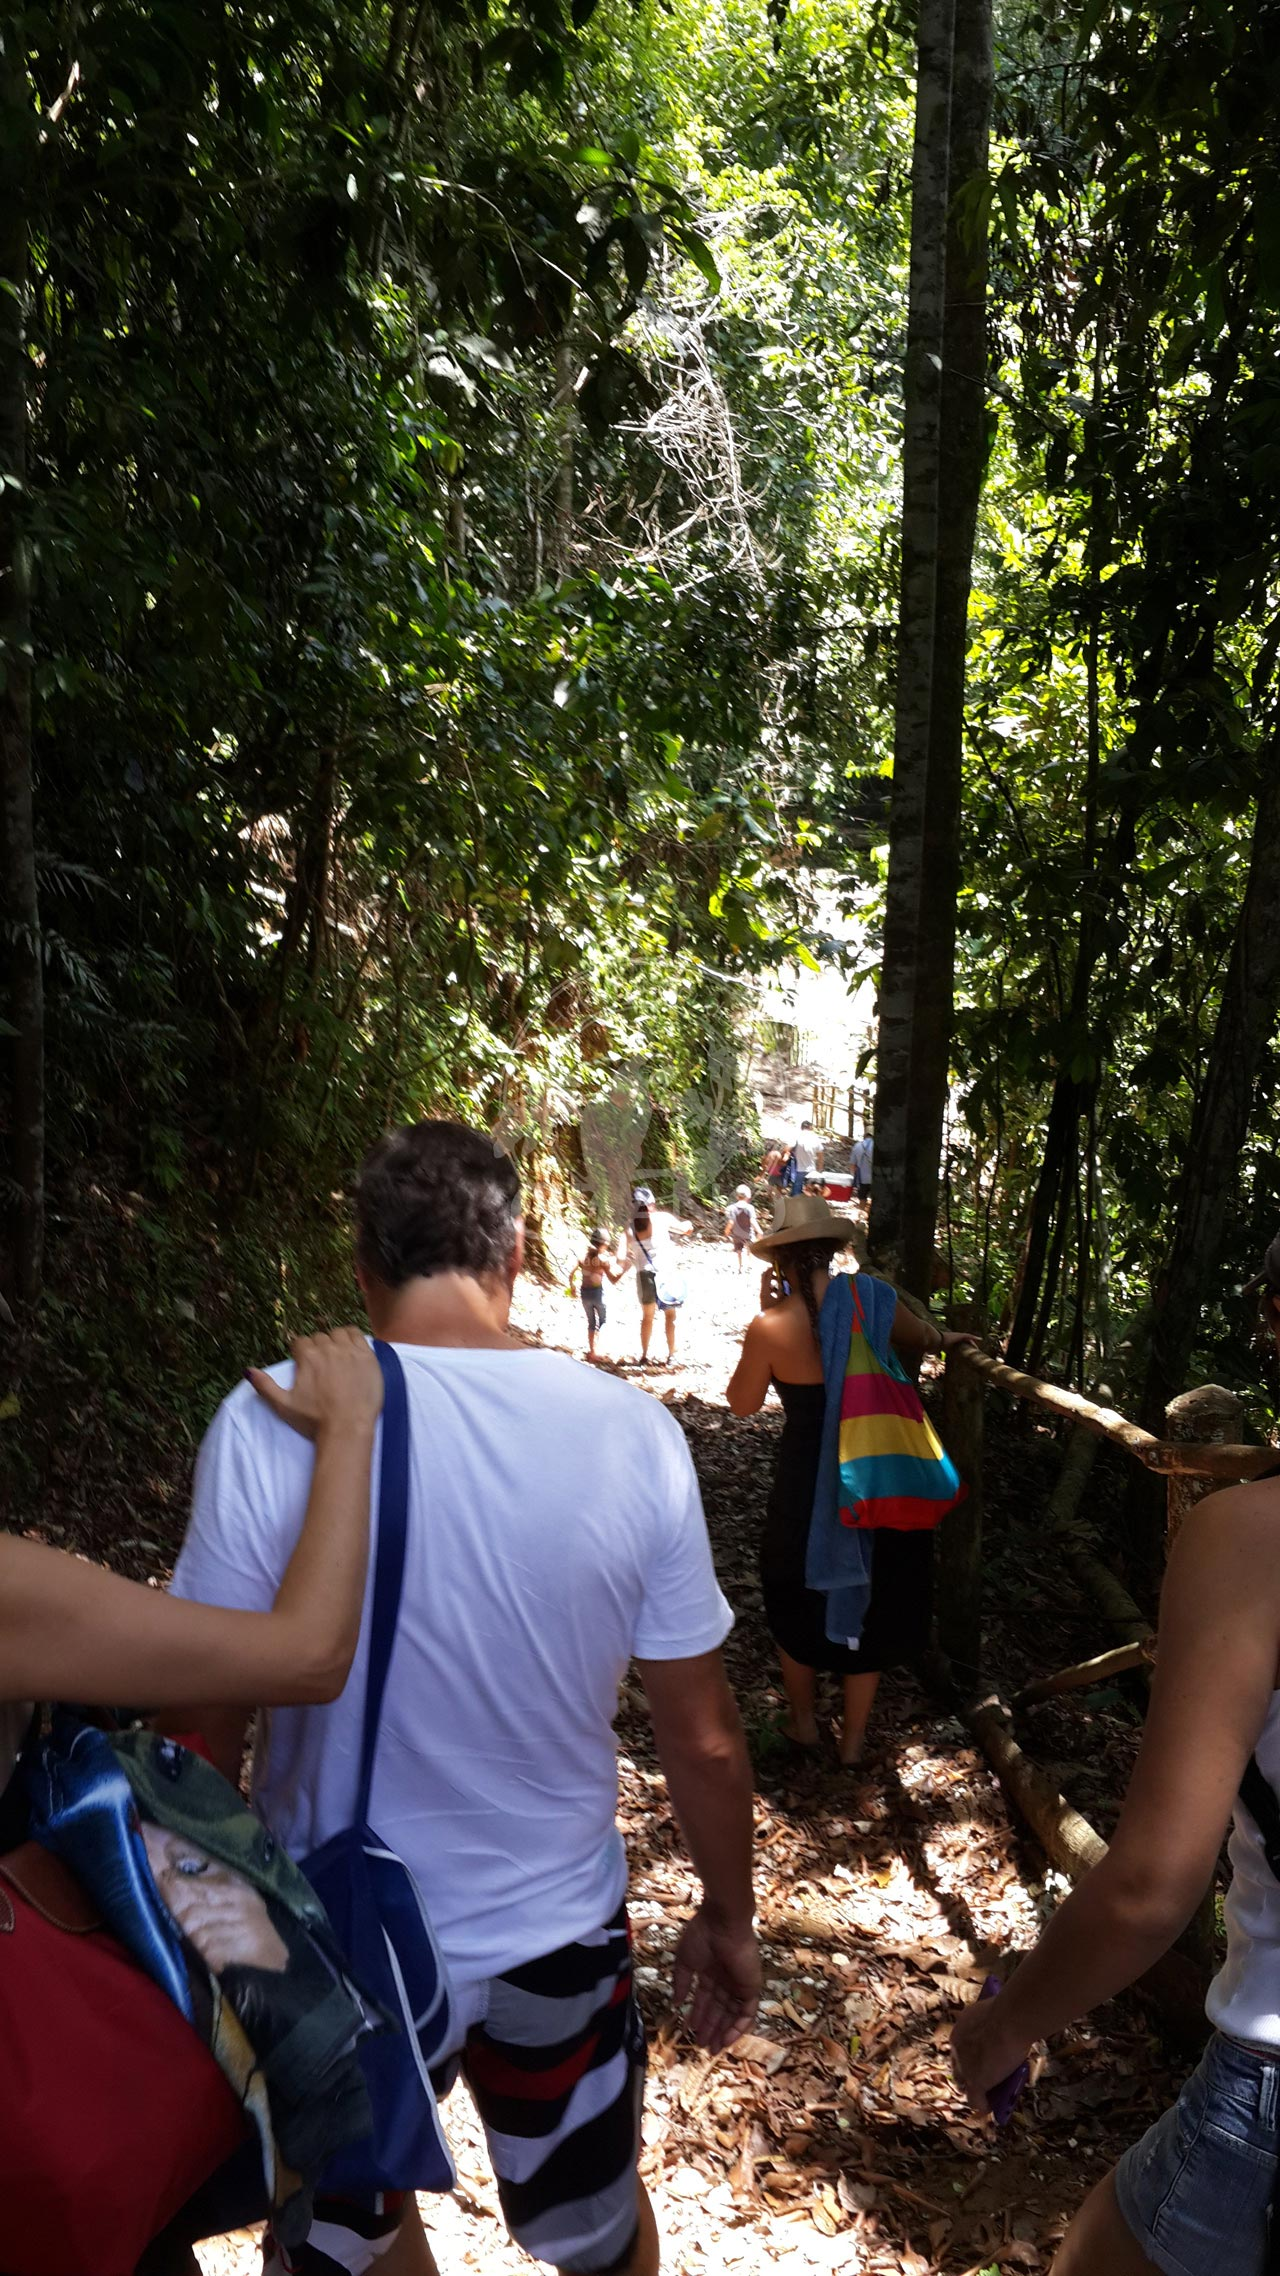 Expedición de bosques en familia - Hotel & Restaurante Parador del Gitano - Nápoles - Doradal - Rio claro